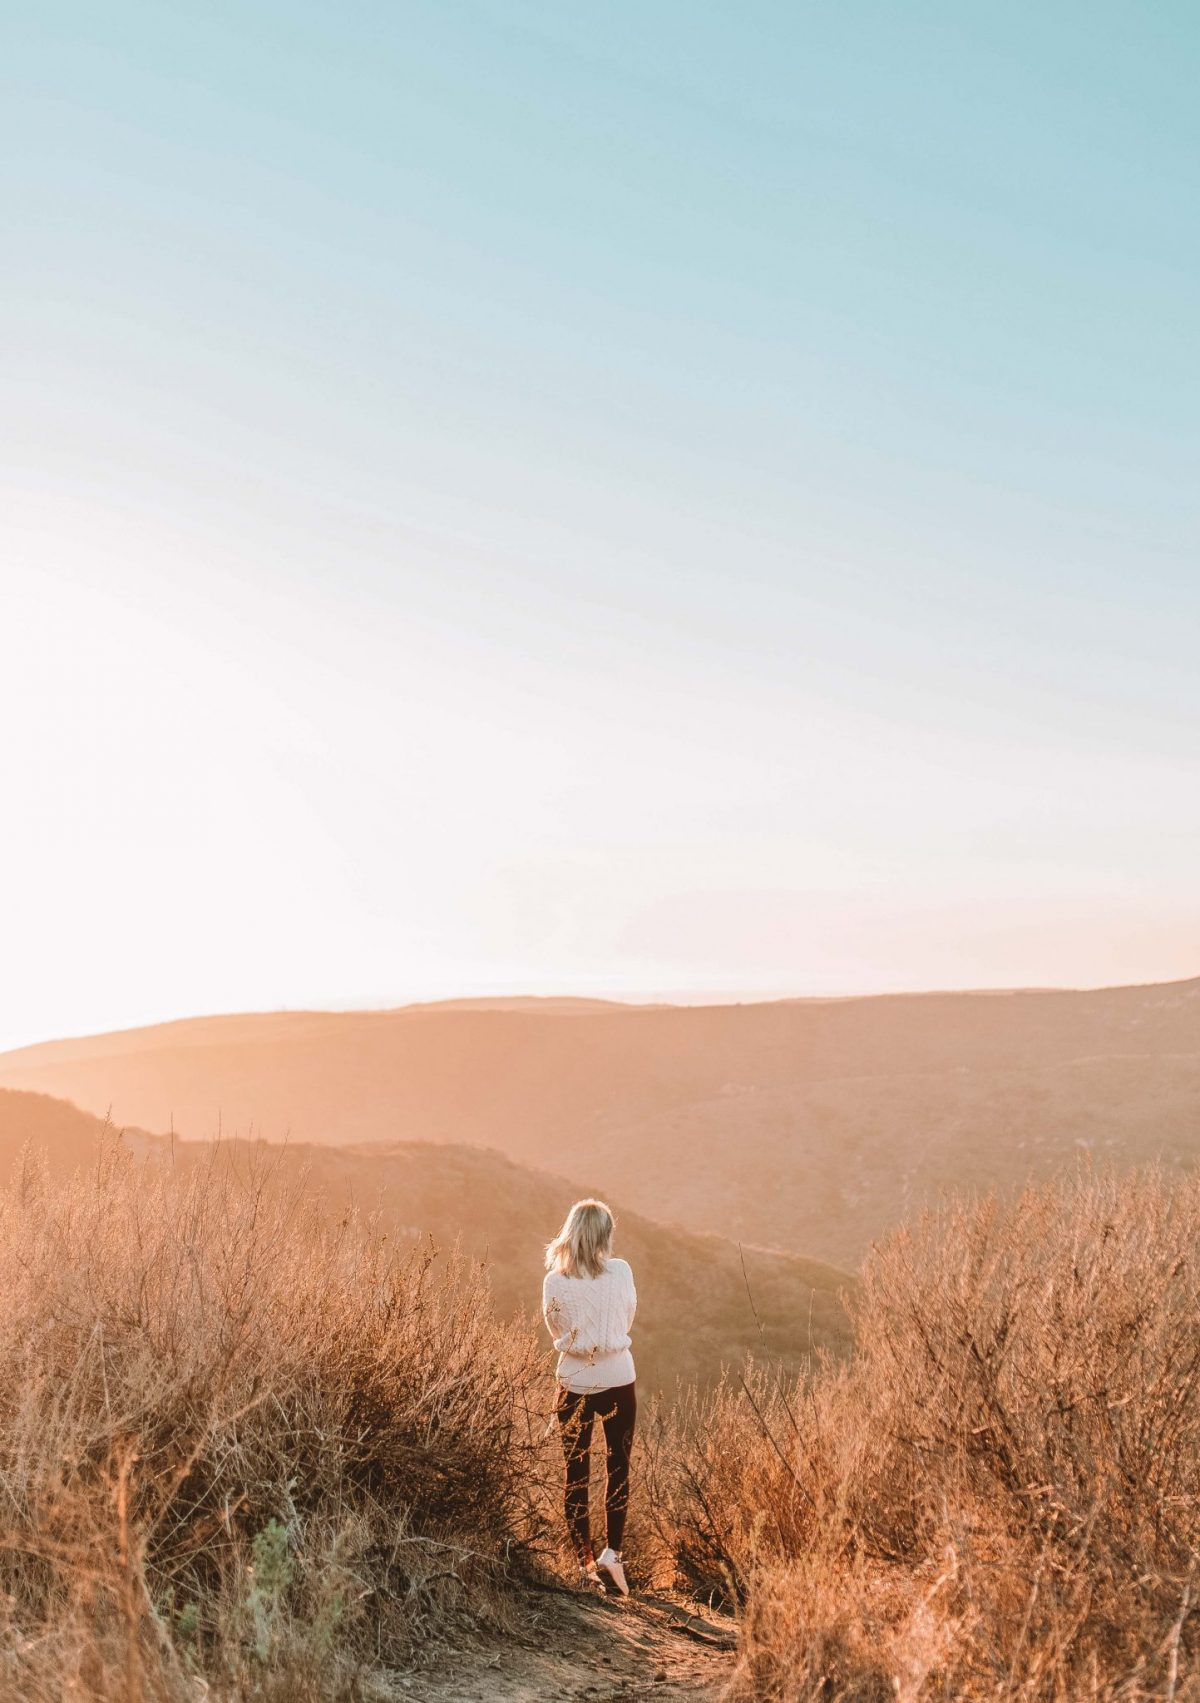 Hiking in Orange County, California